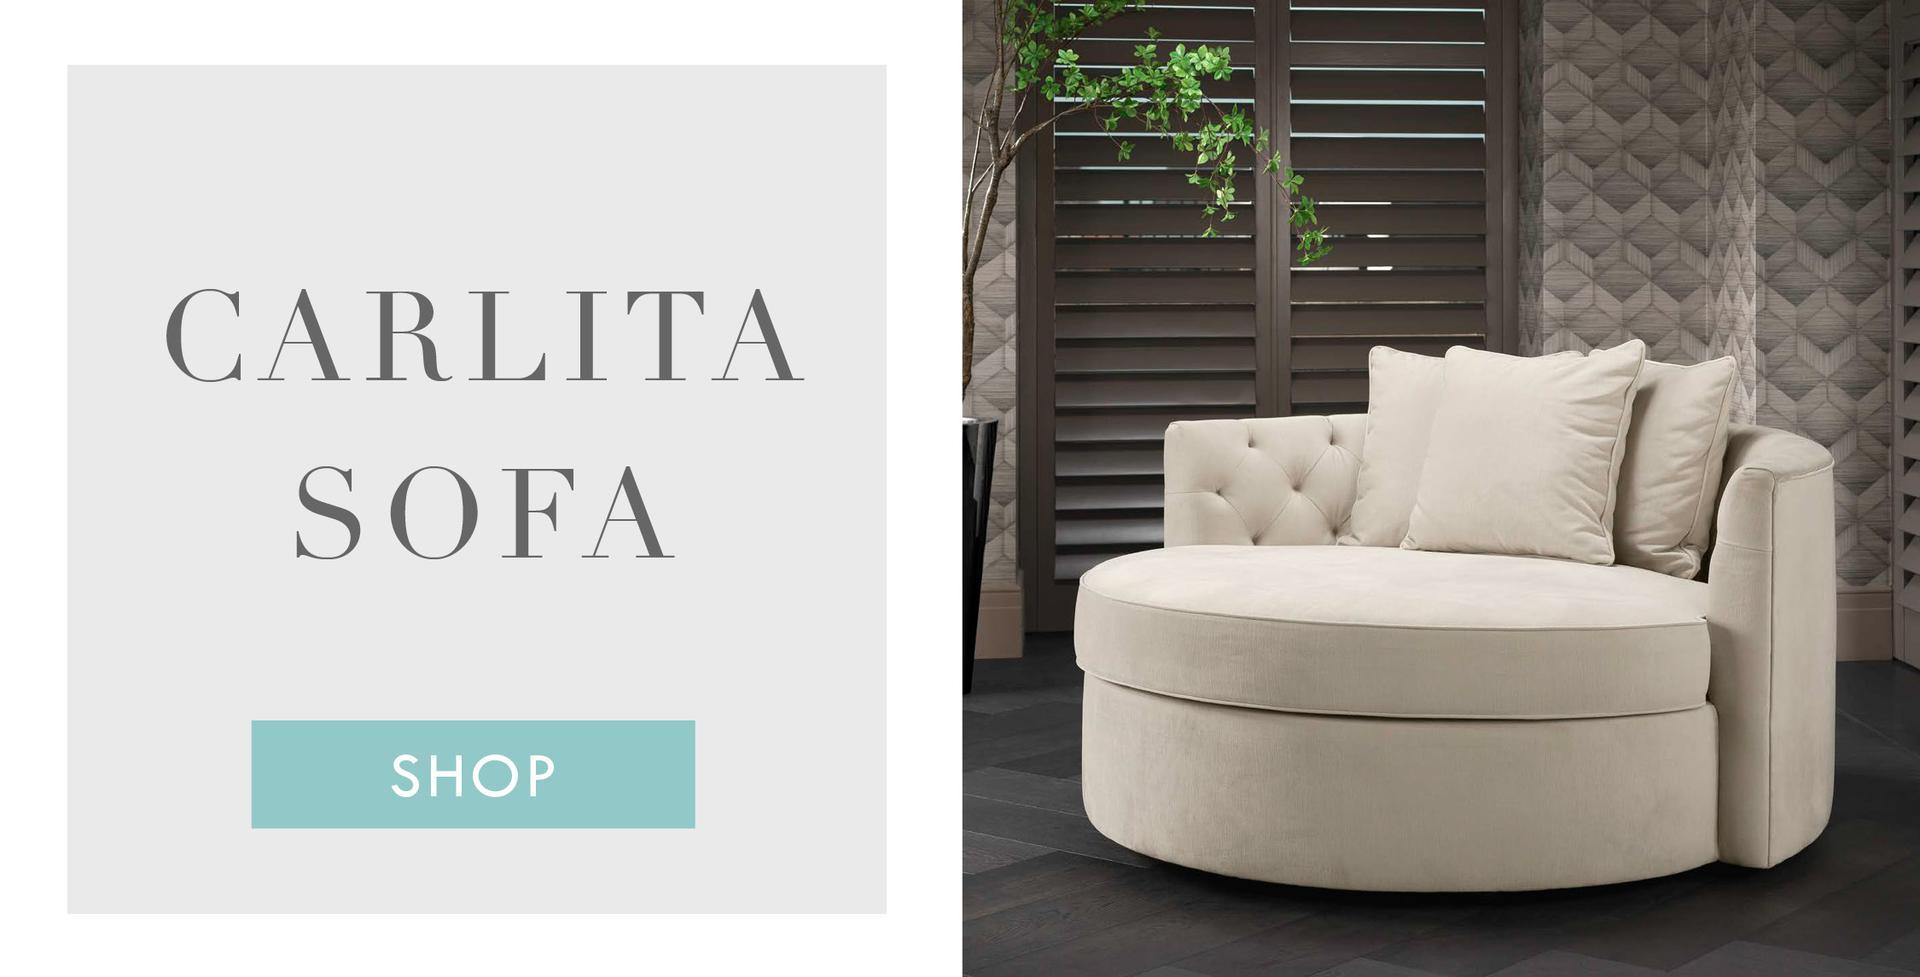 Shop The Carlita Sofa